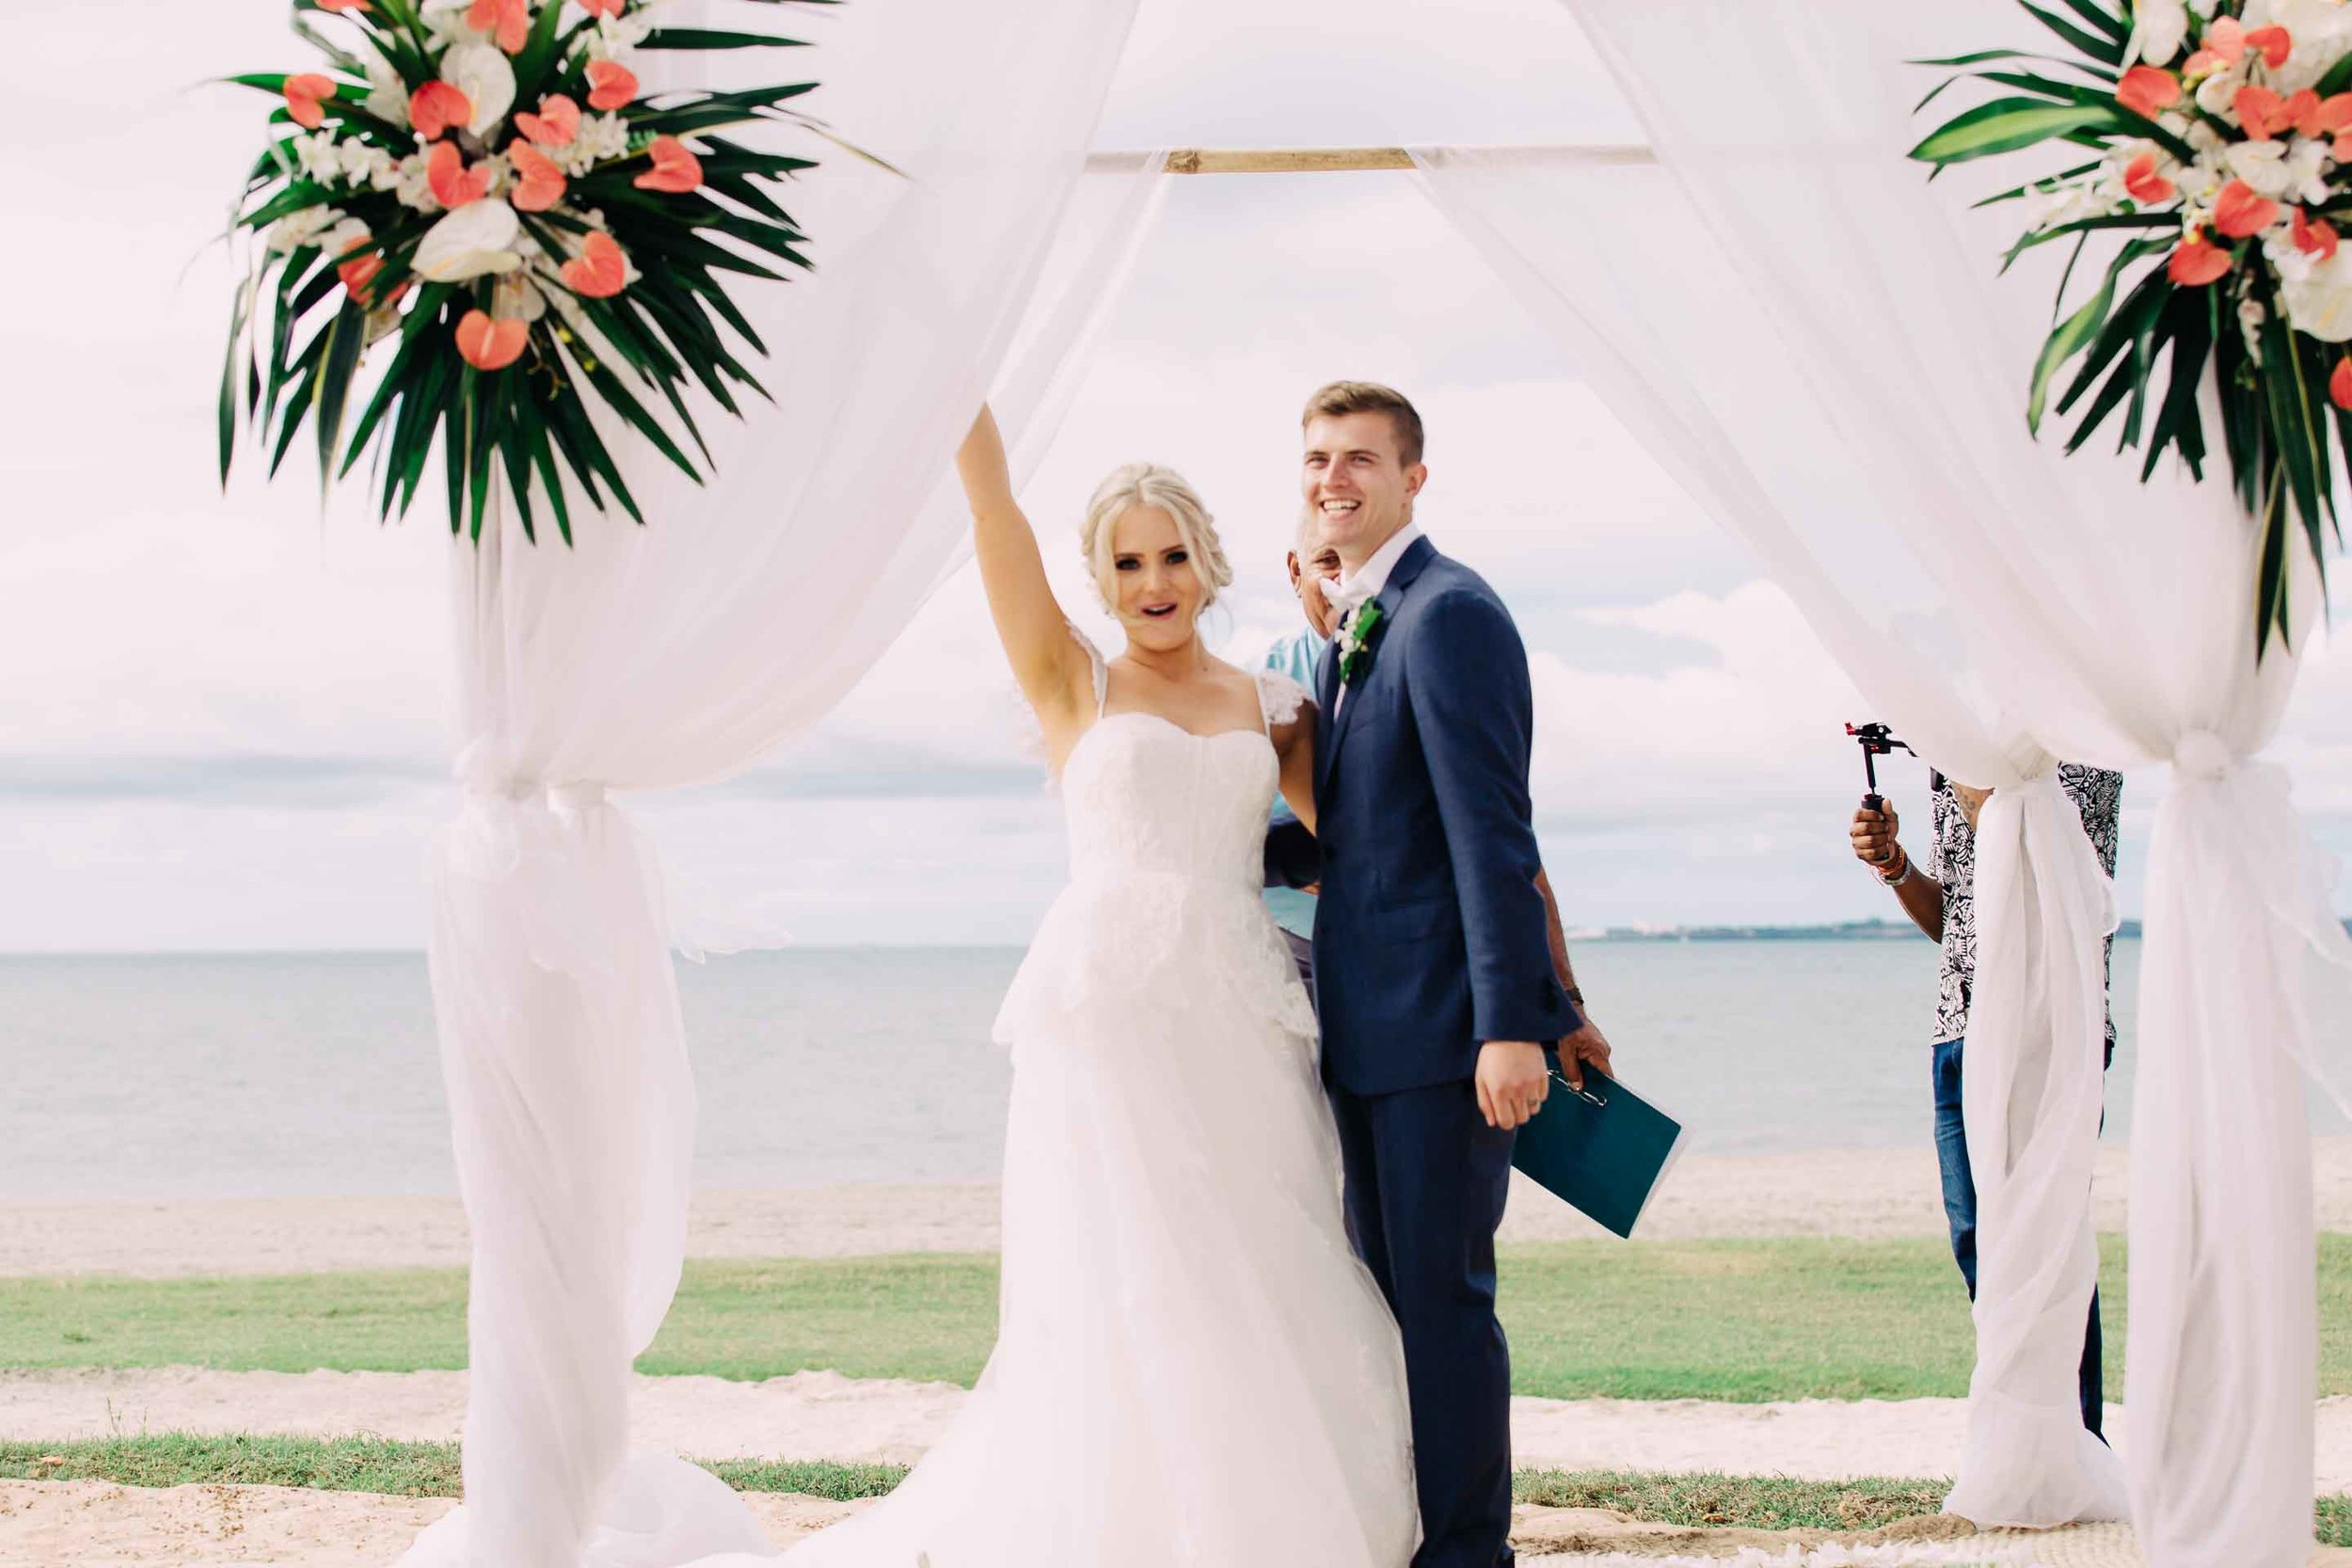 Newlyweds. Just pronounced husband and wife